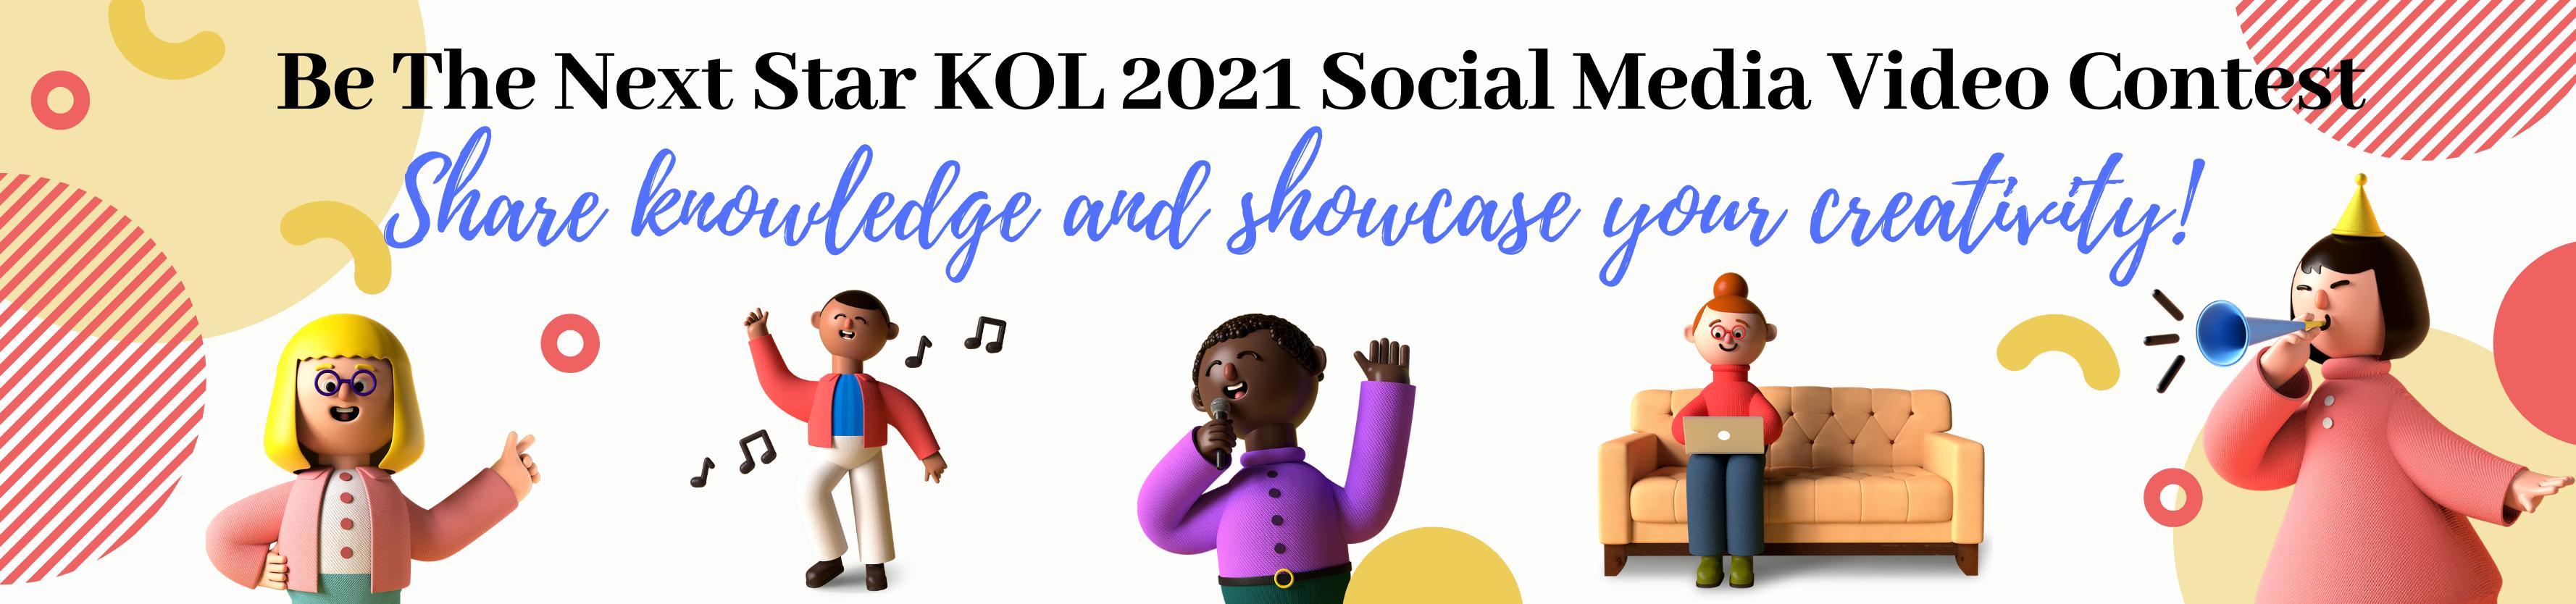 Be The Next Star KOL 2021 Social Media Video Contest